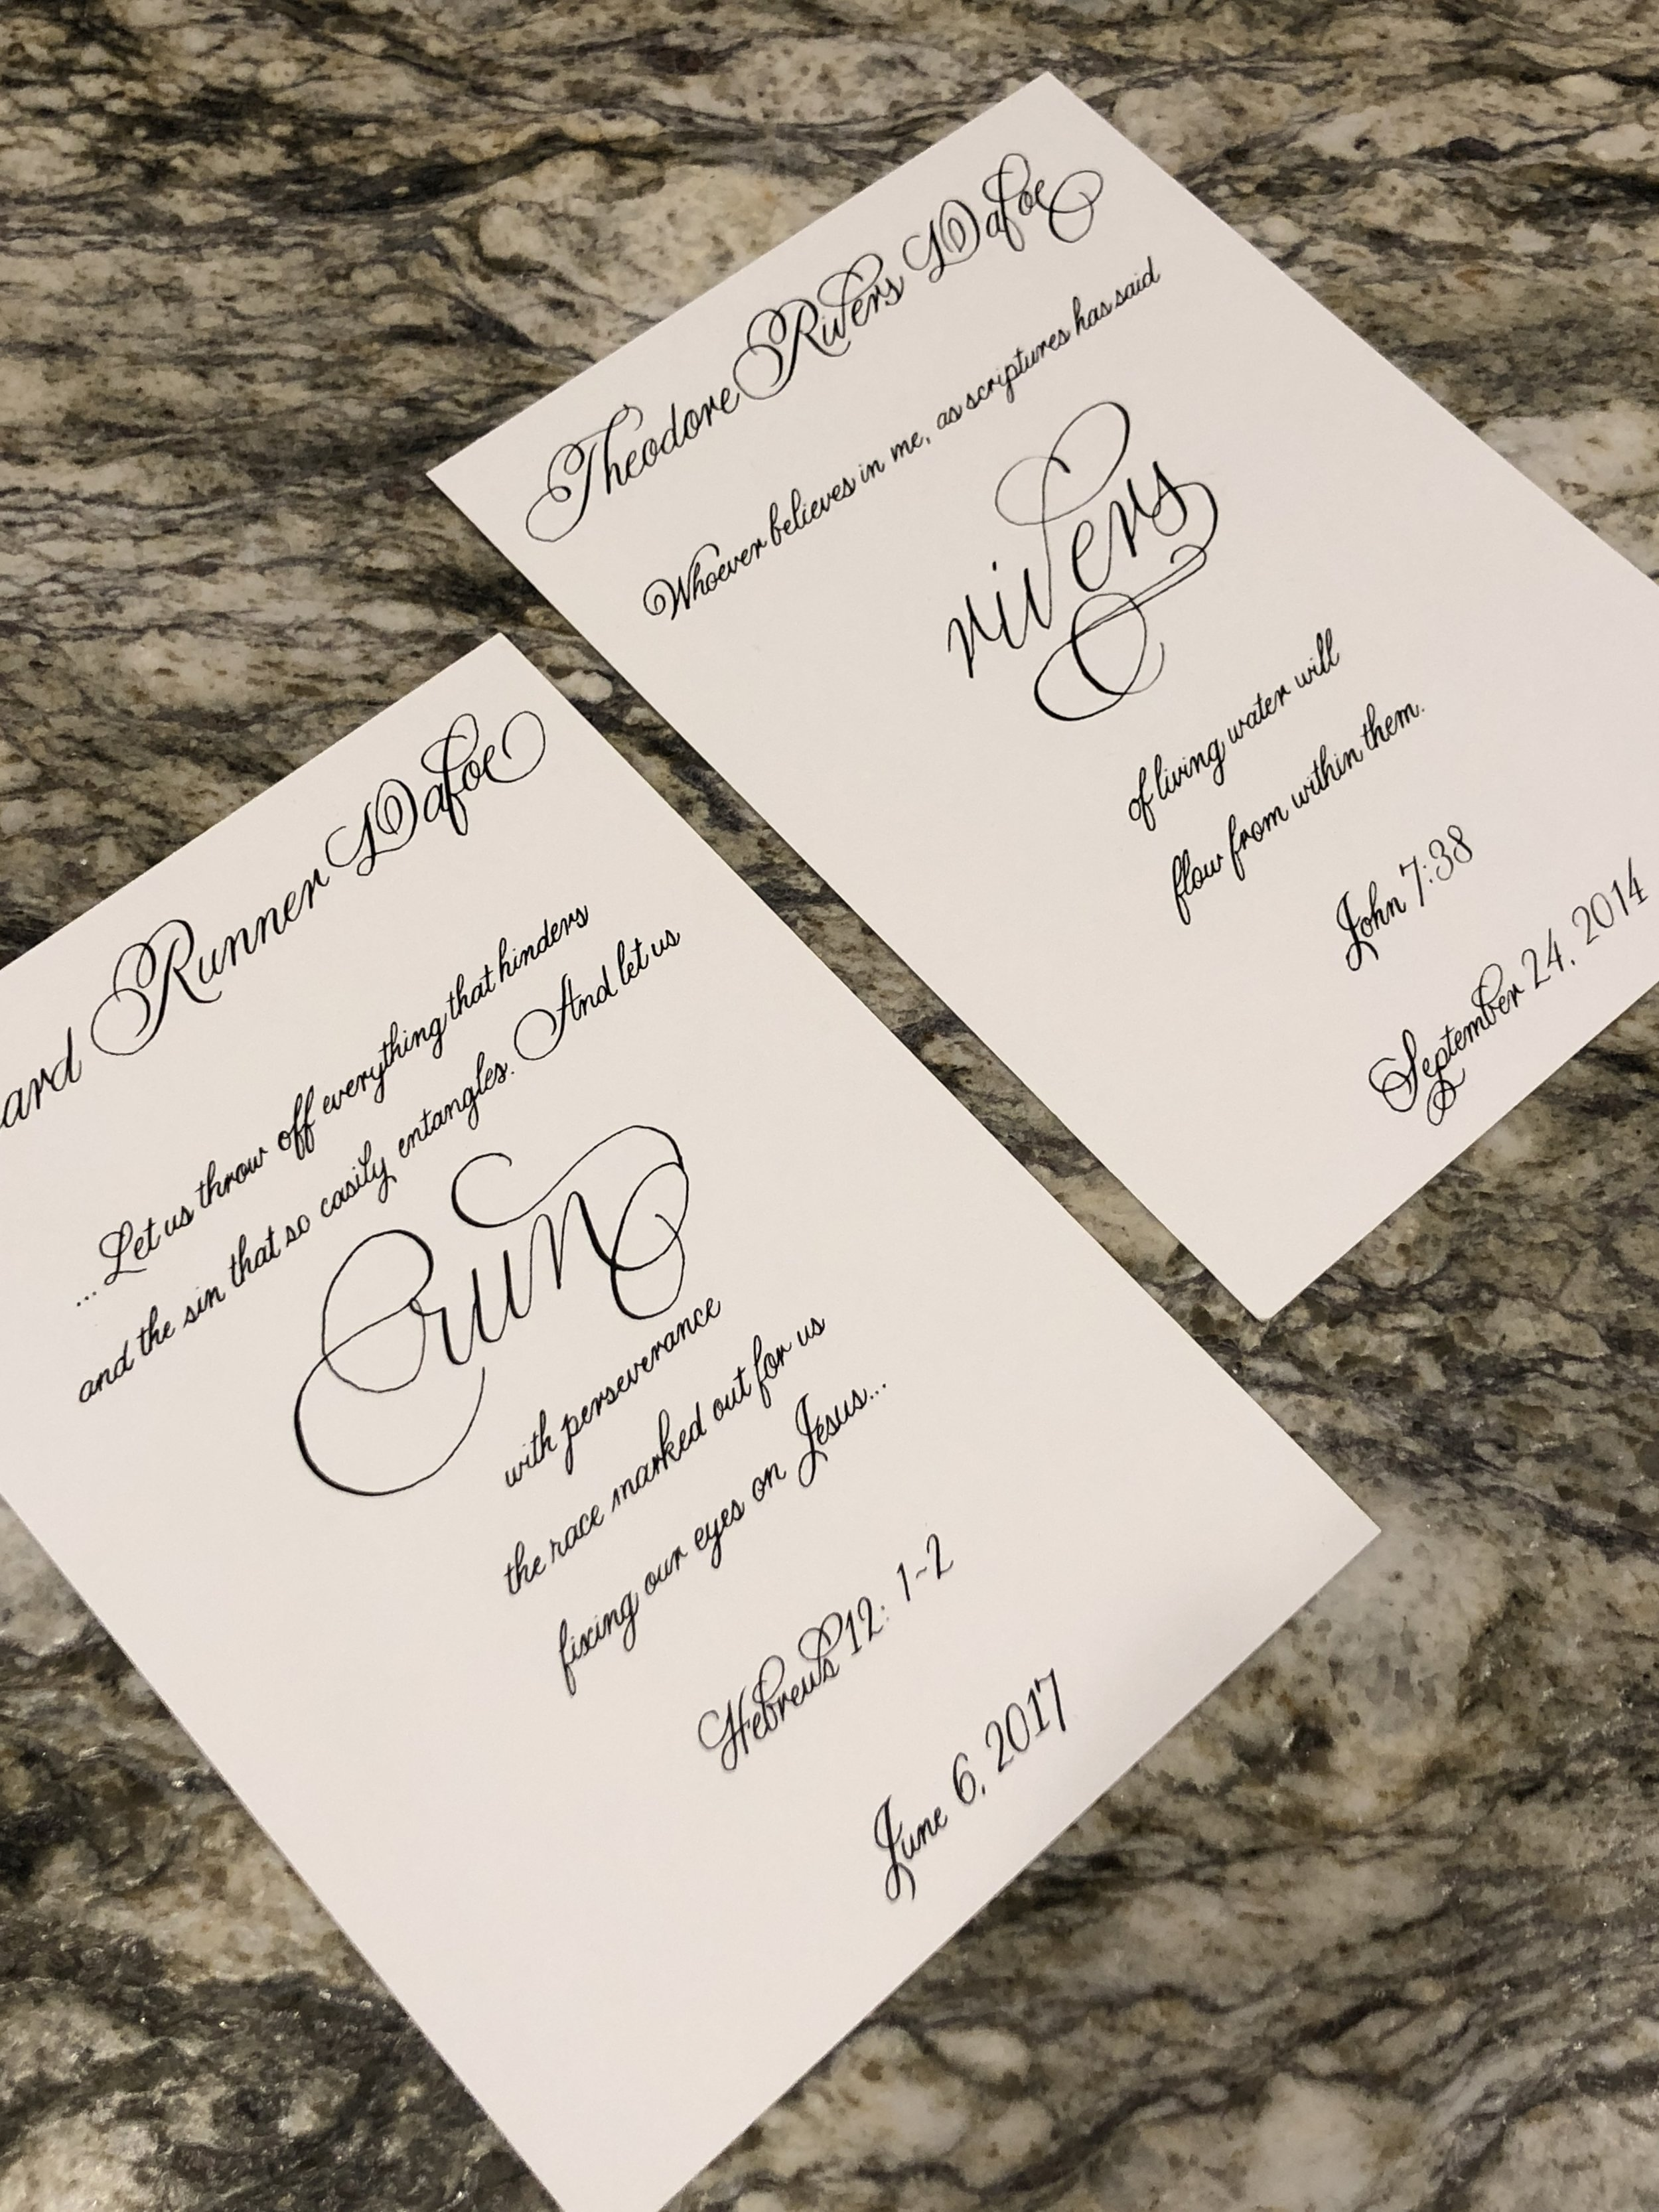 Central PA, York PA, JesSmith Designs, custom, wedding, invitations, bridal, Harrisburg, hanover, calligraphy, baltimore, wedding invitations, lancaster, gettysburg, 06-27 19.58.30.jpg